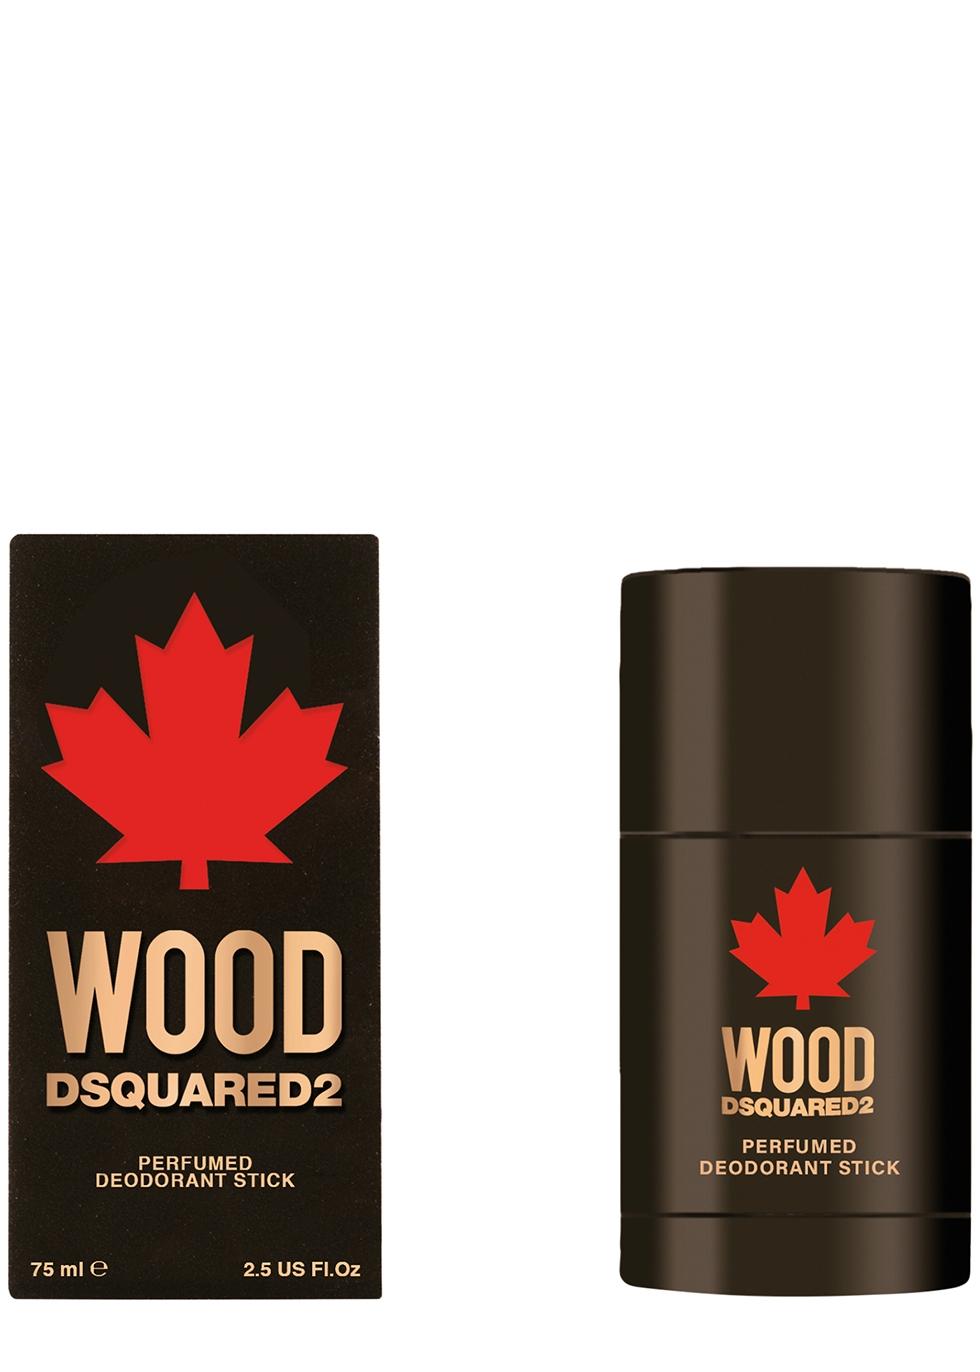 Wood Pour Homme Deodorant Stick 75ml - Dsquared2